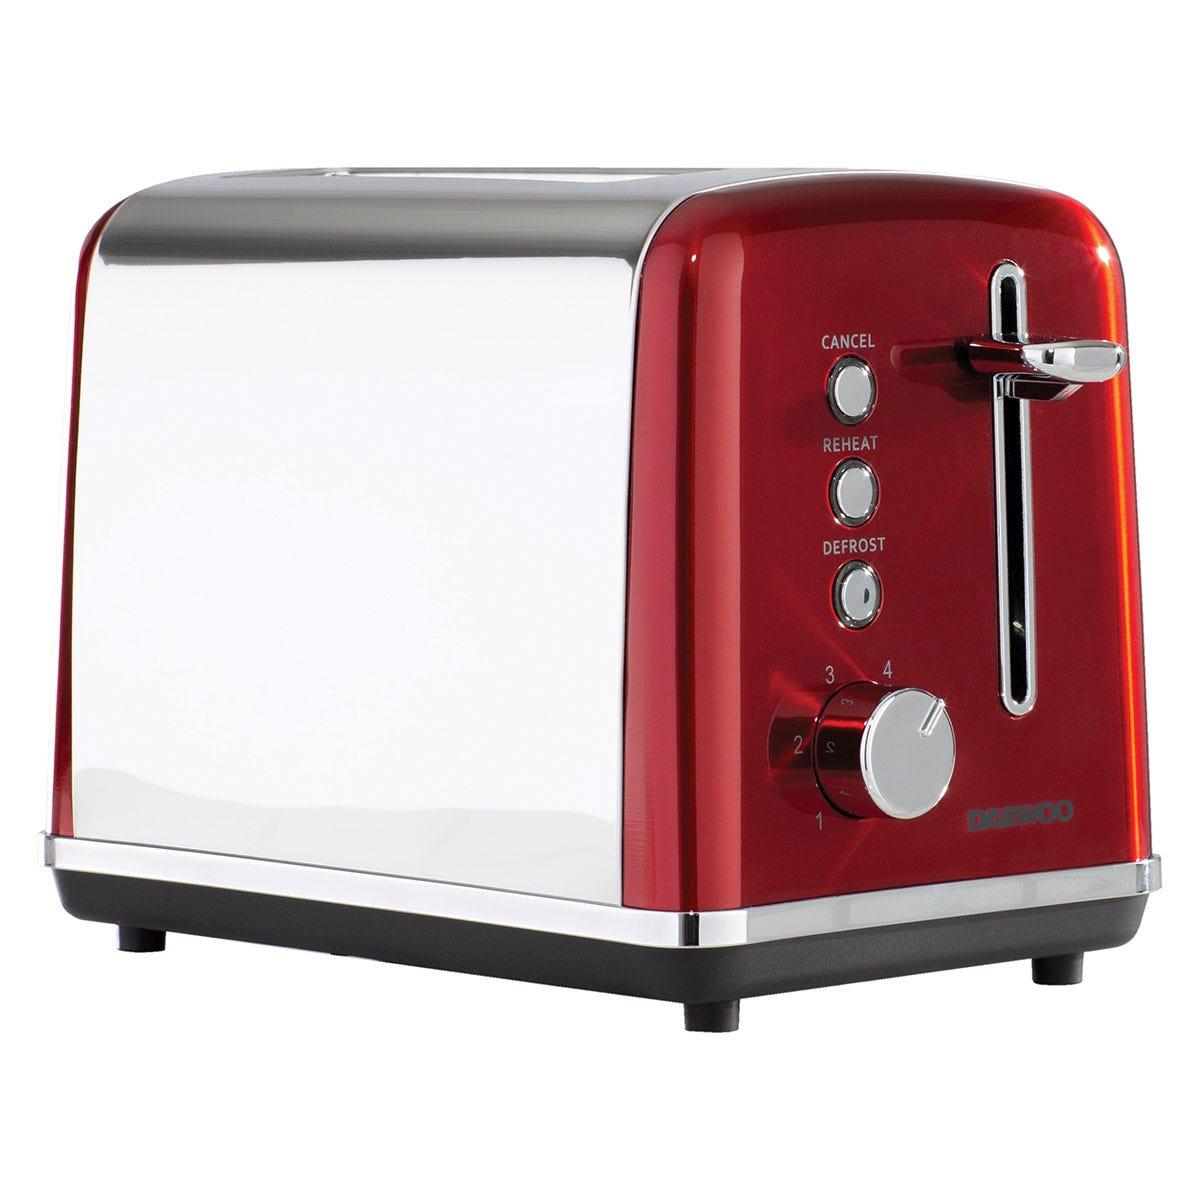 Daewoo SDA1584 Kensington 810W 2-Slice Toaster - Red